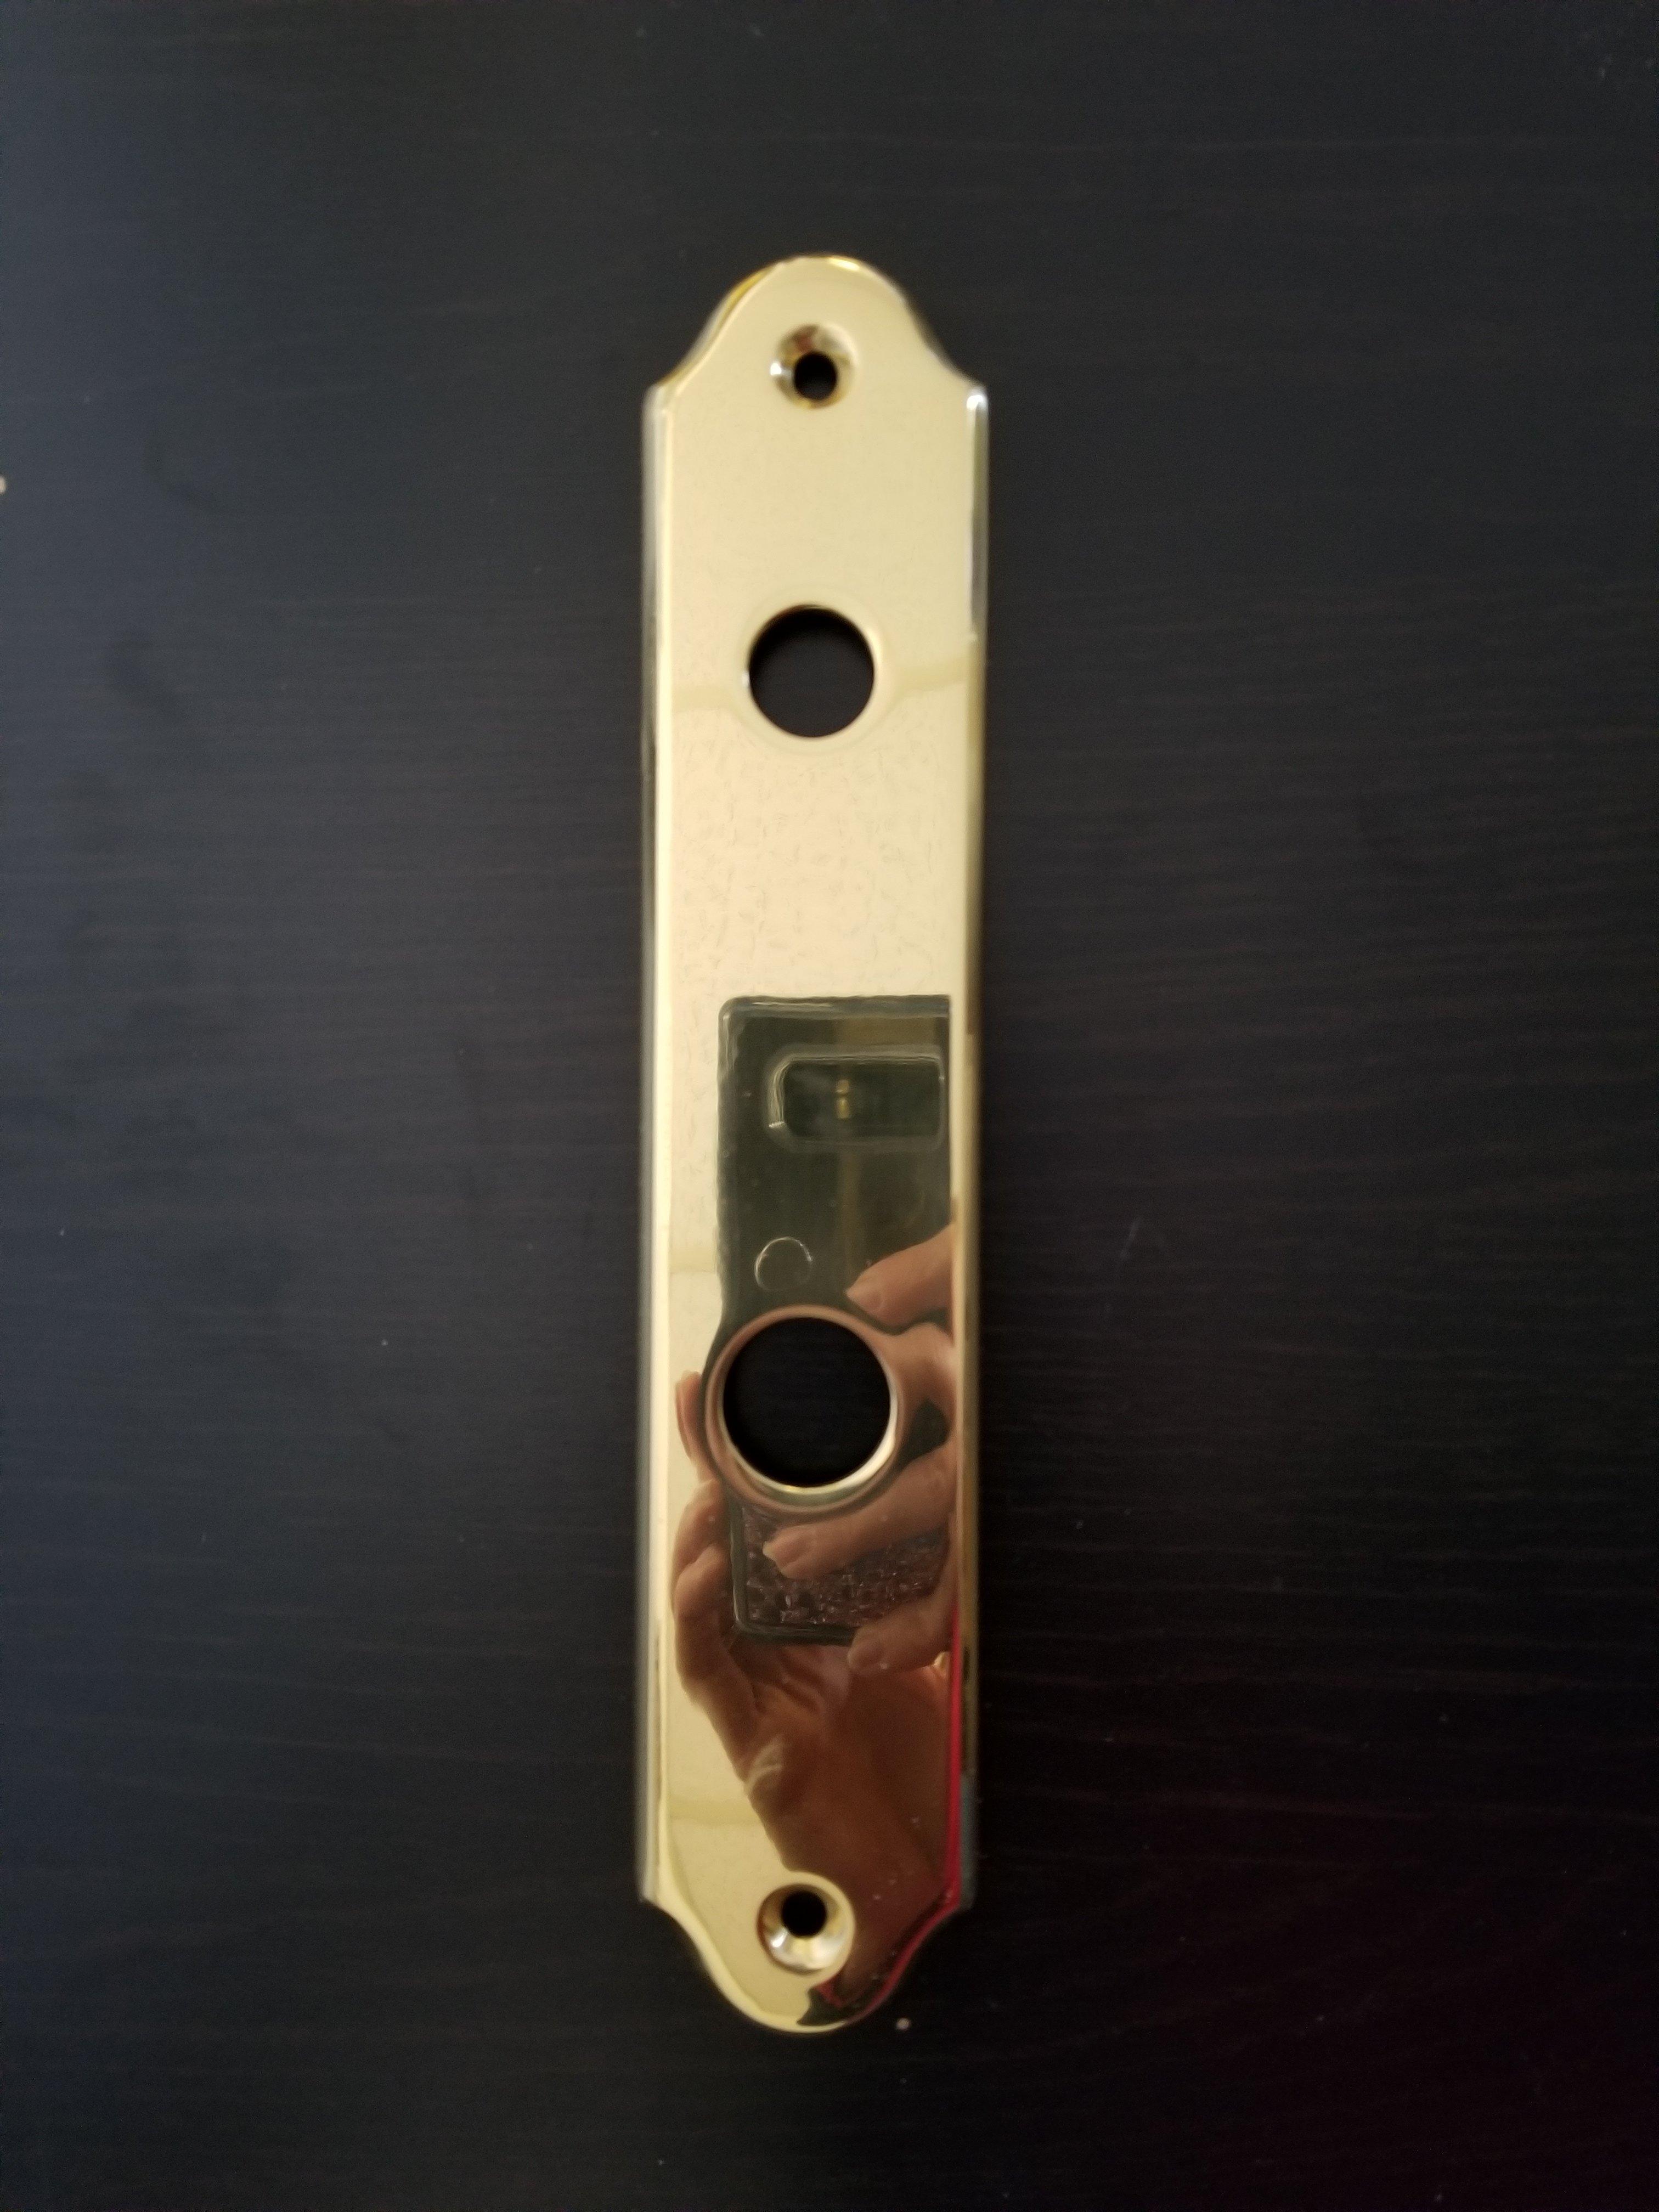 840 012 Amesbury Truth Gu Faceplate Swinging Patio Door Hurd Patio Doors Patio Hurd Windows